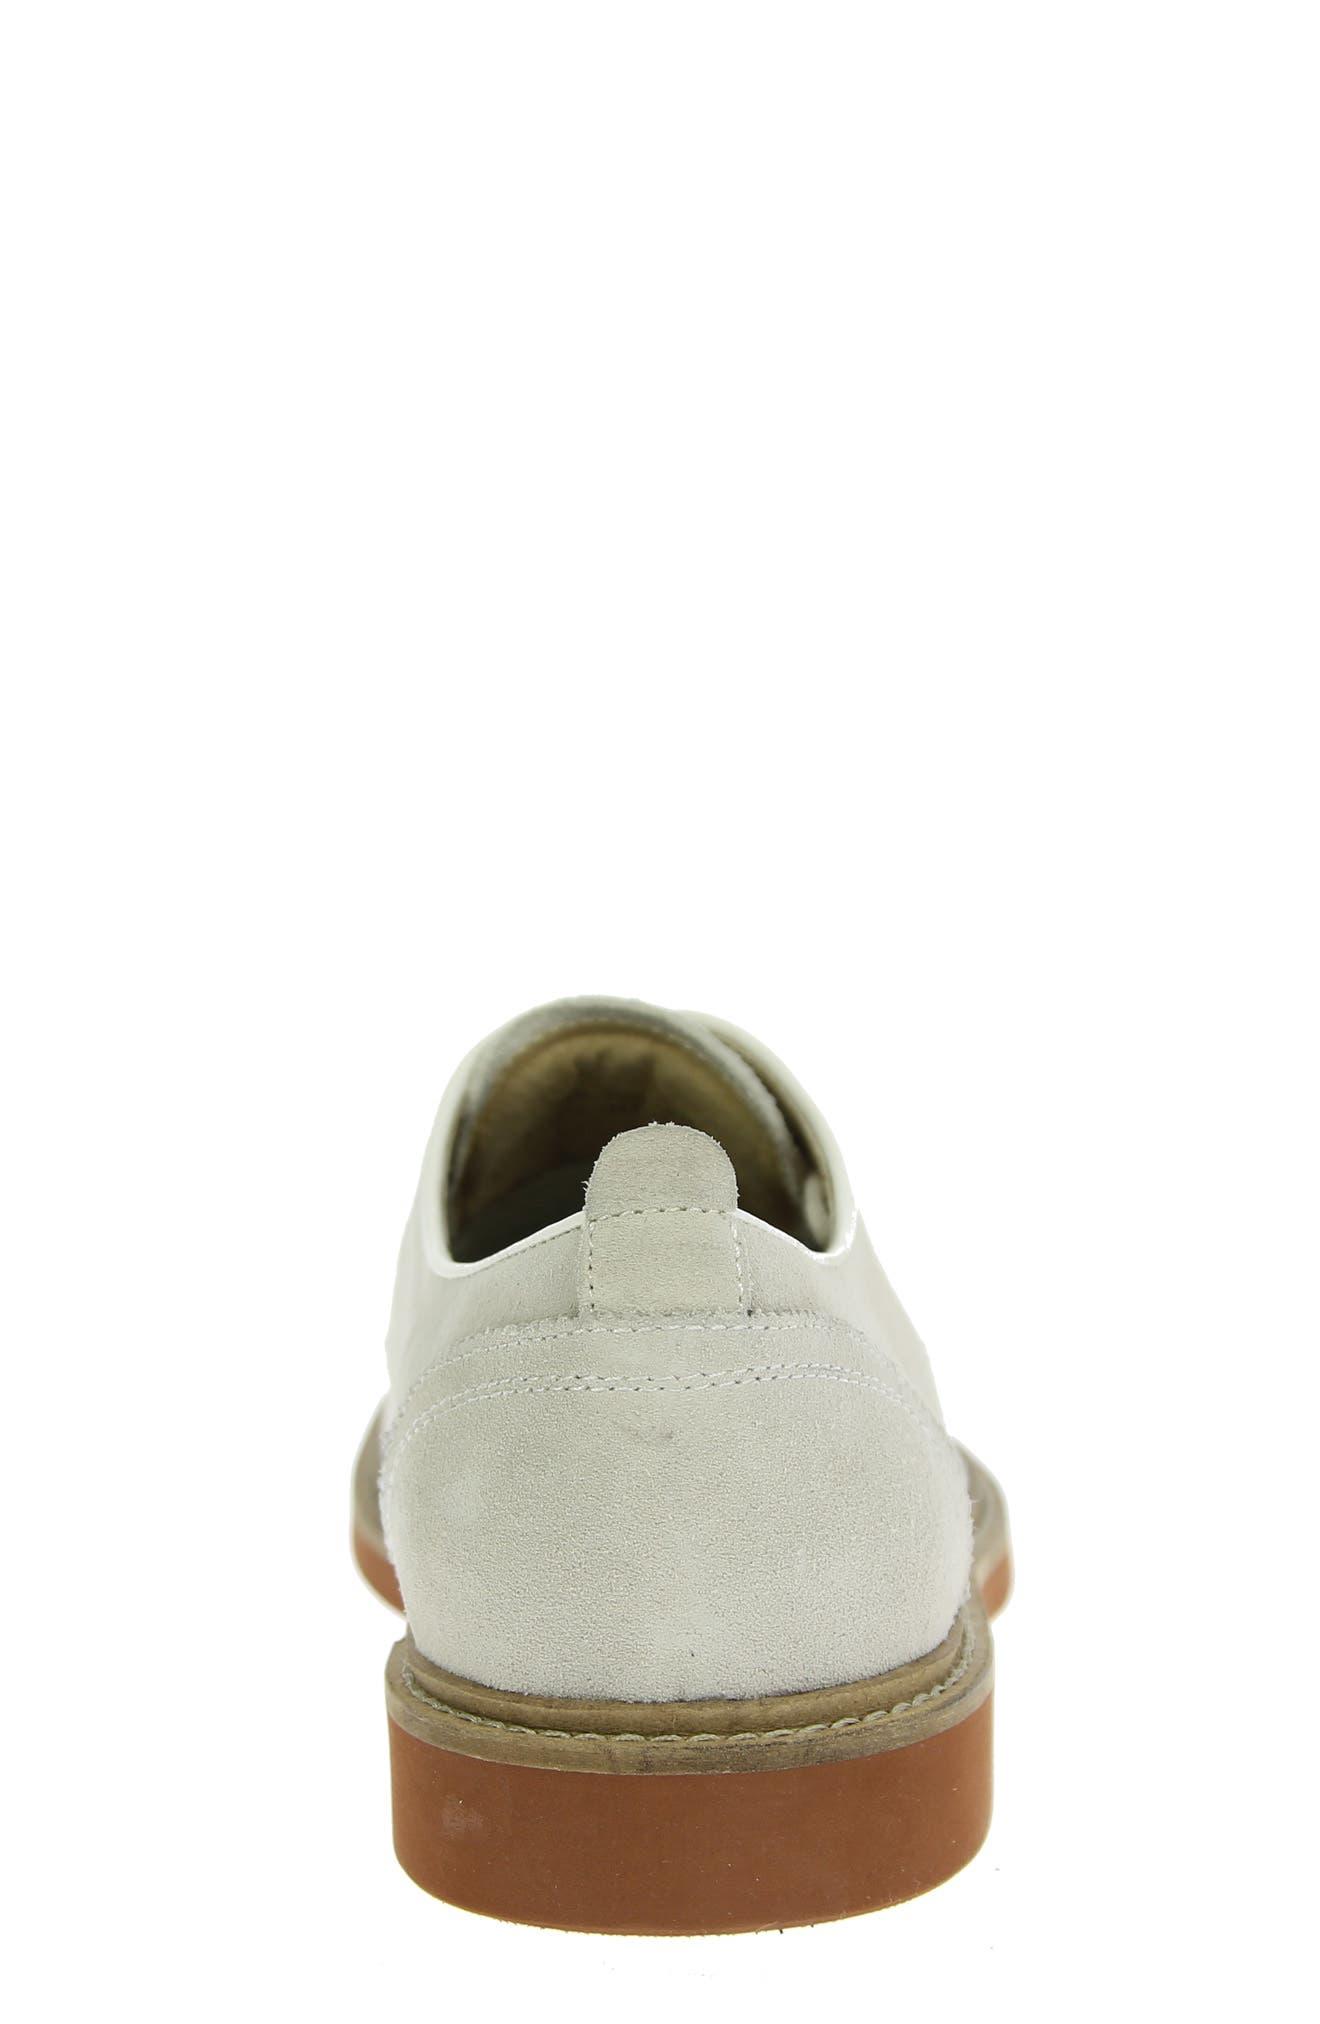 'Bucktown' Buck Shoe,                             Alternate thumbnail 2, color,                             WHITE SUEDE